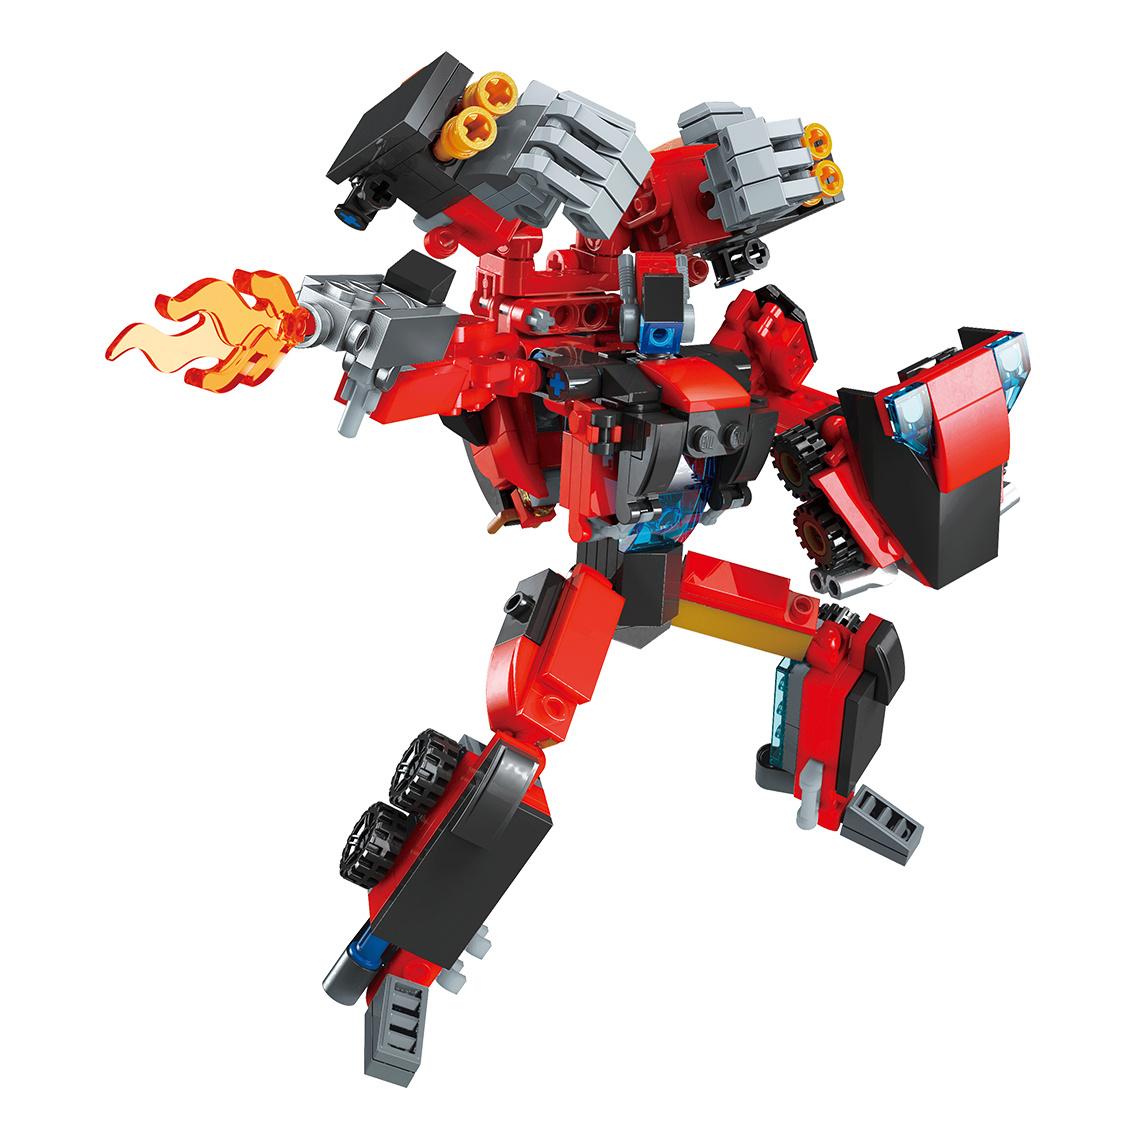 Qman Iron Fist Commander 41302